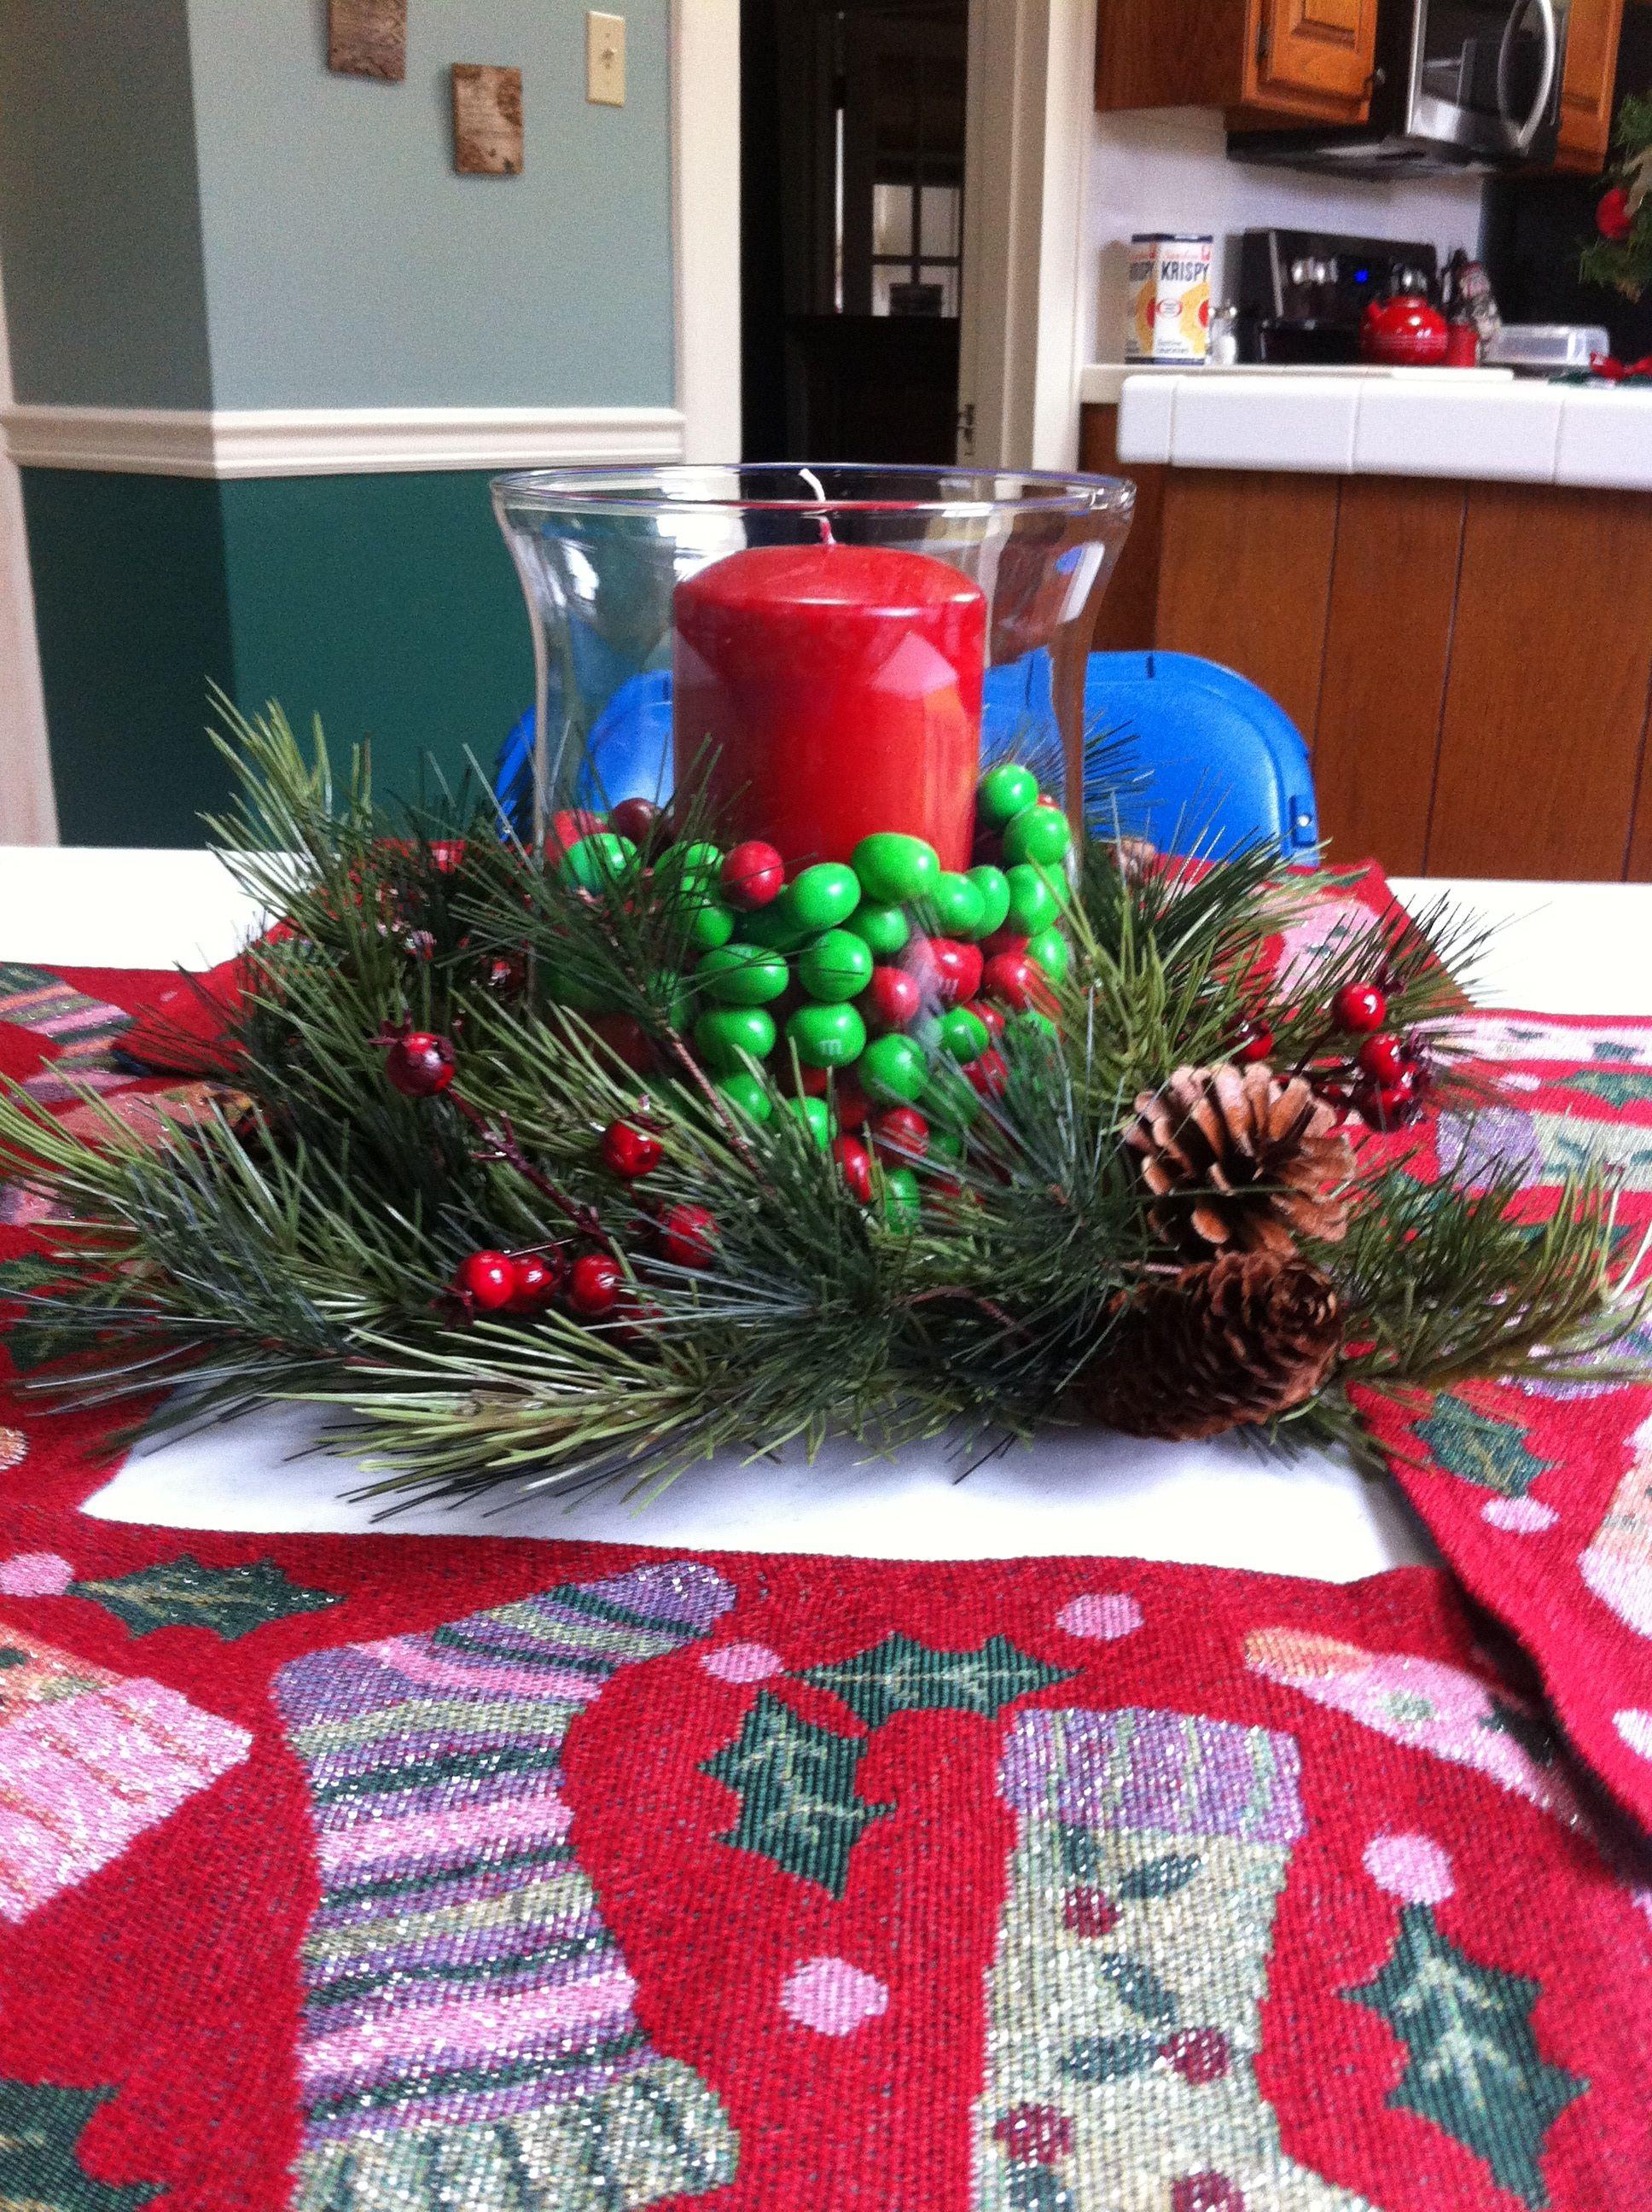 M Christmas candle centerpiece